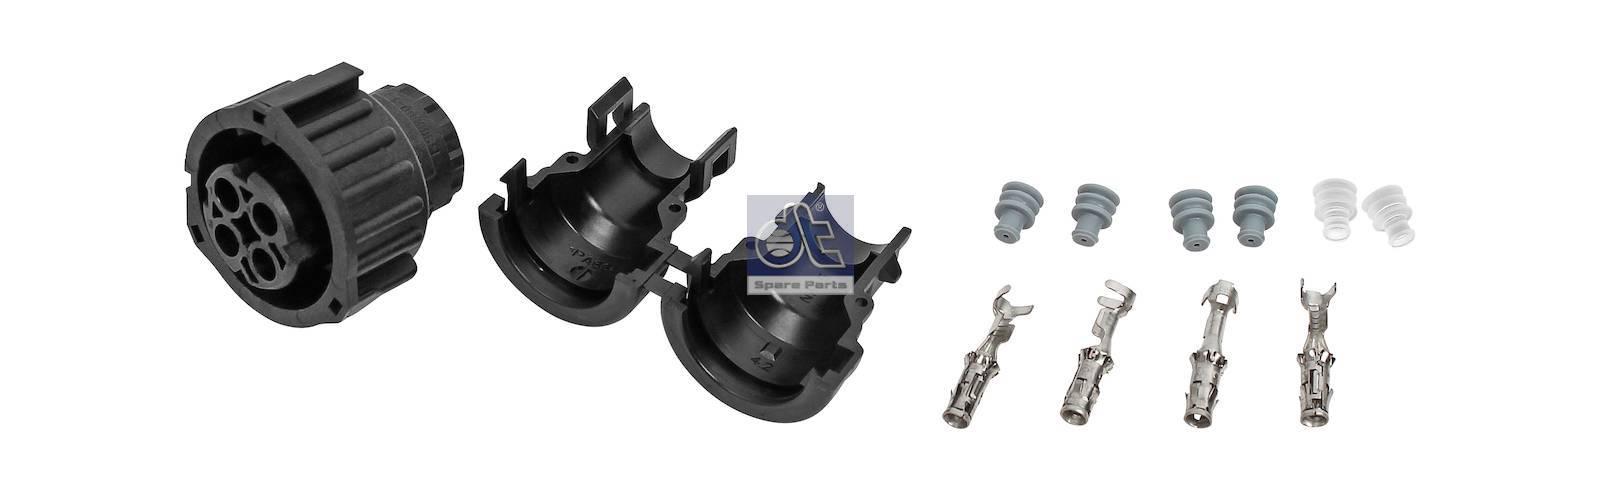 DT 1 32178 Repair kit, plug suitable for Renault, Scania, Volvo